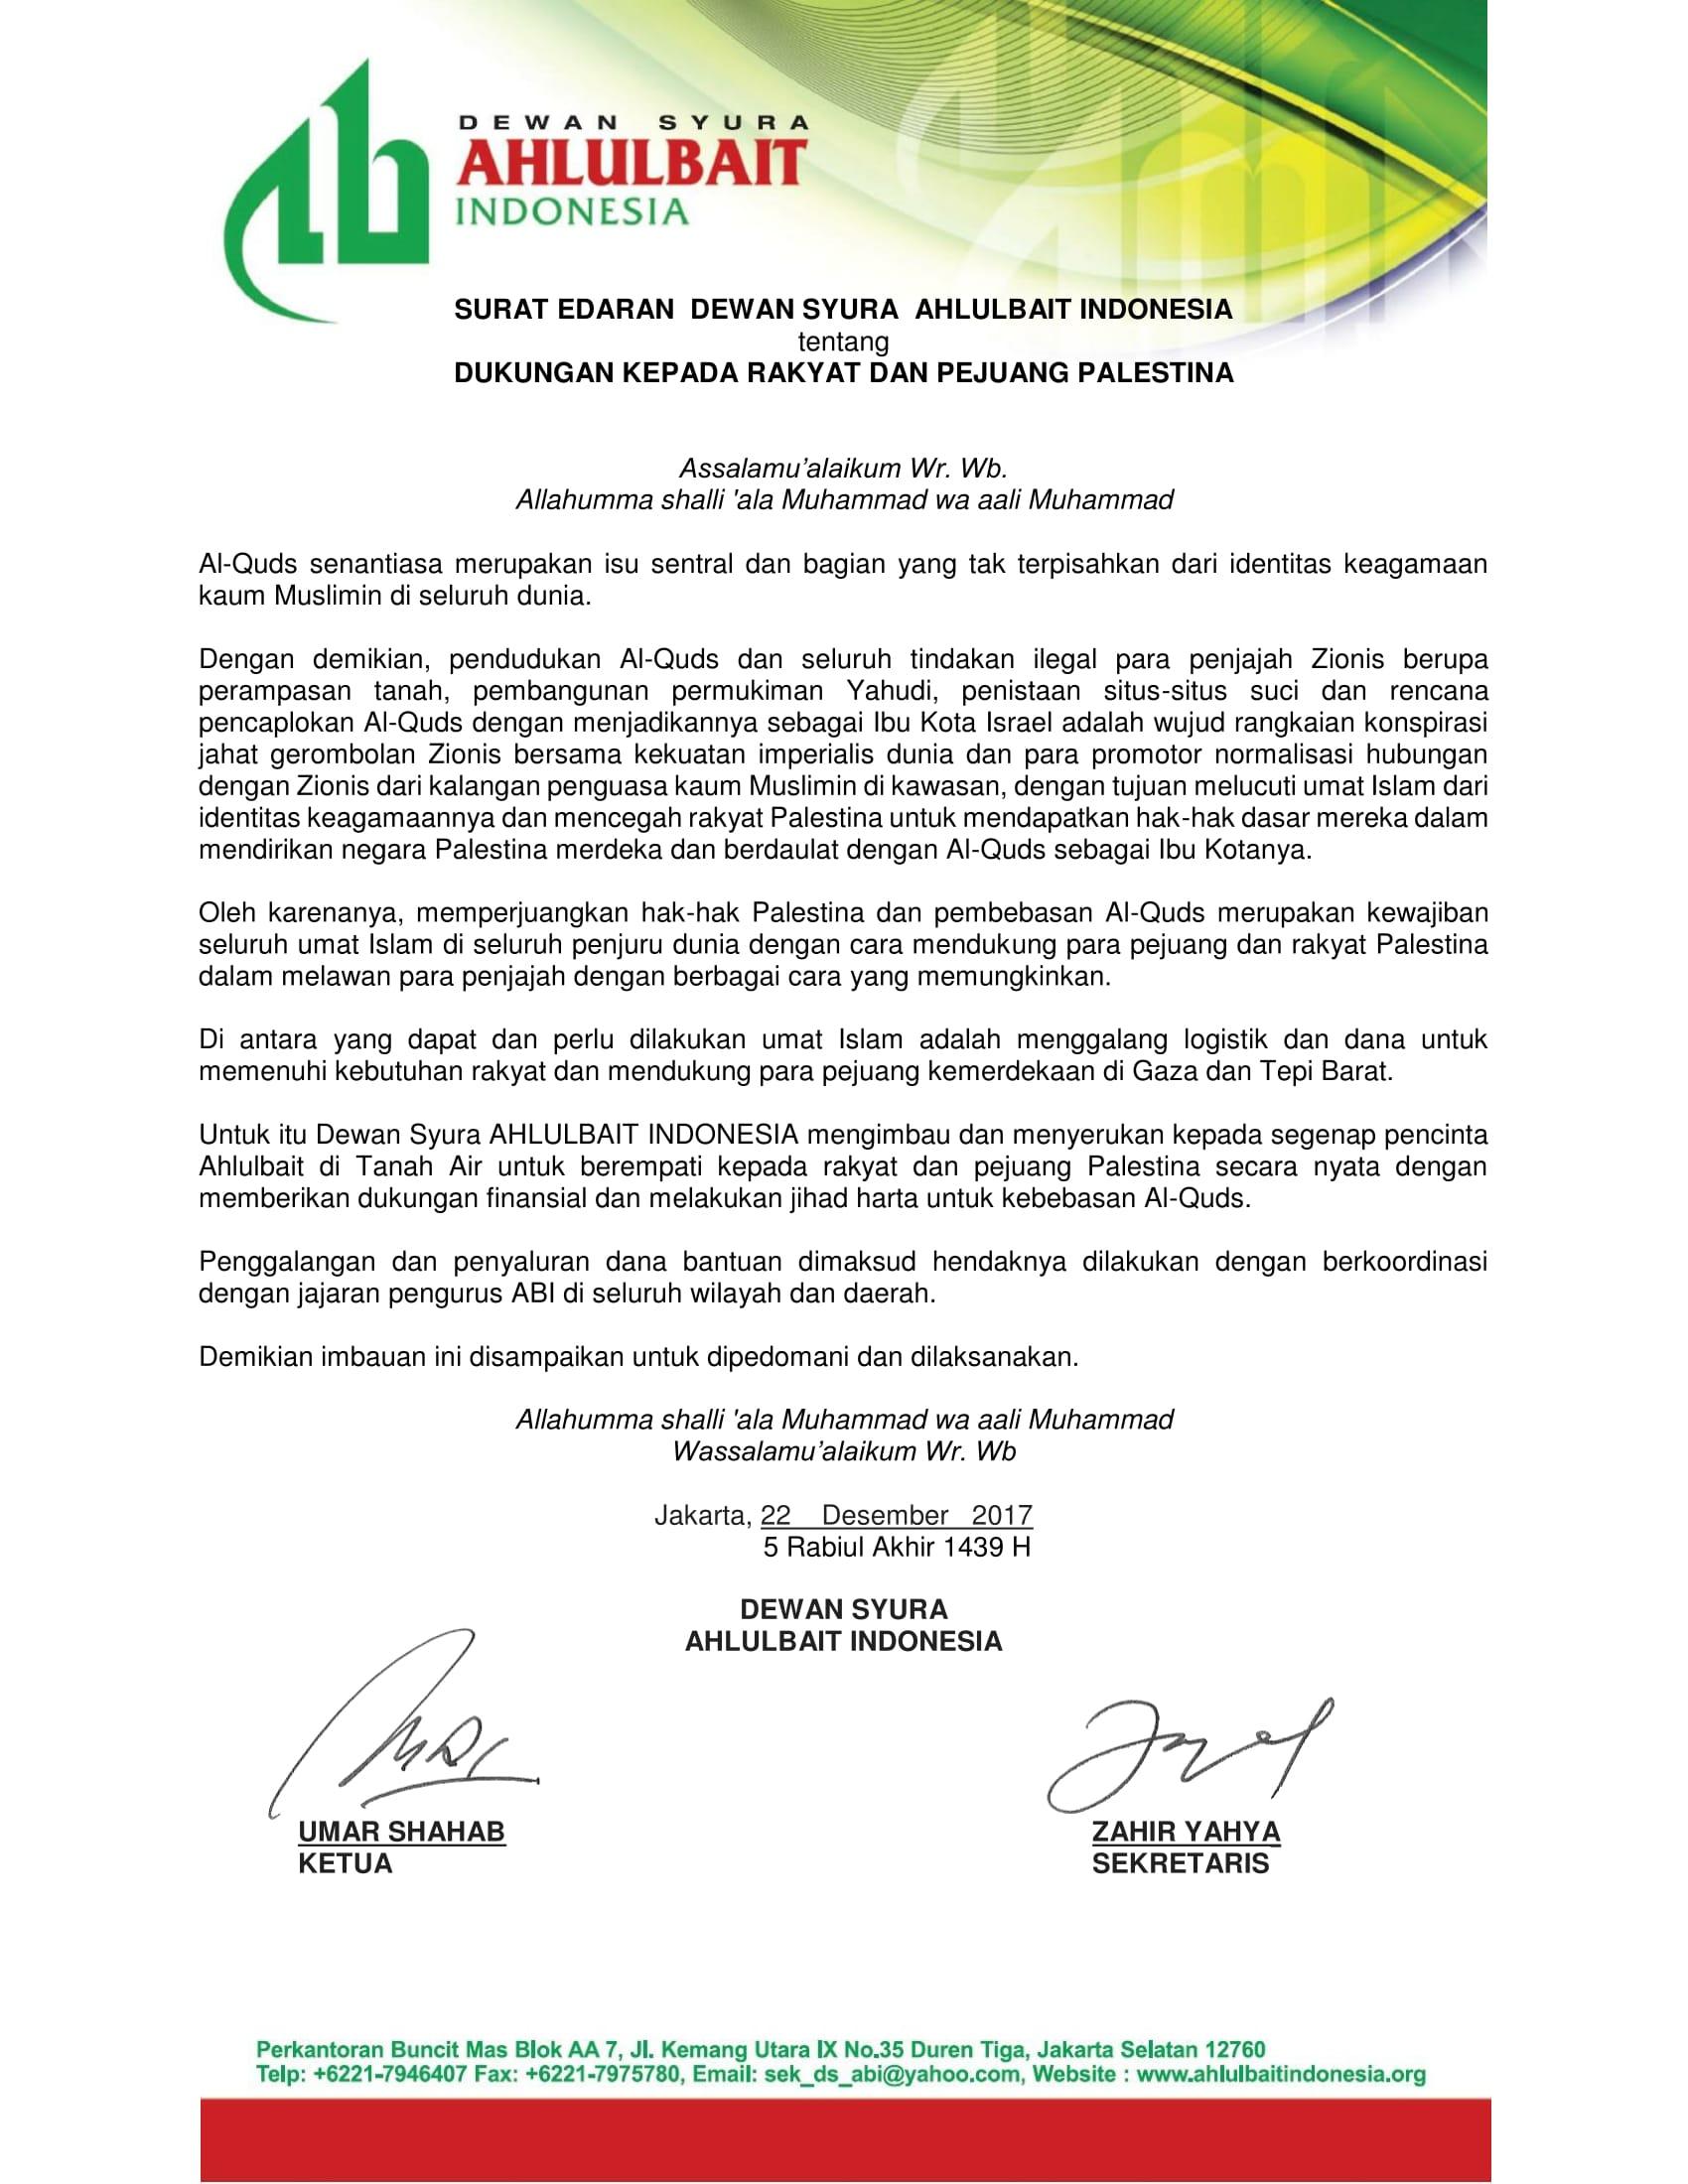 SURAT EDARAN DEWAN SYURA AHLULBAIT INDONESIA FINAL-1